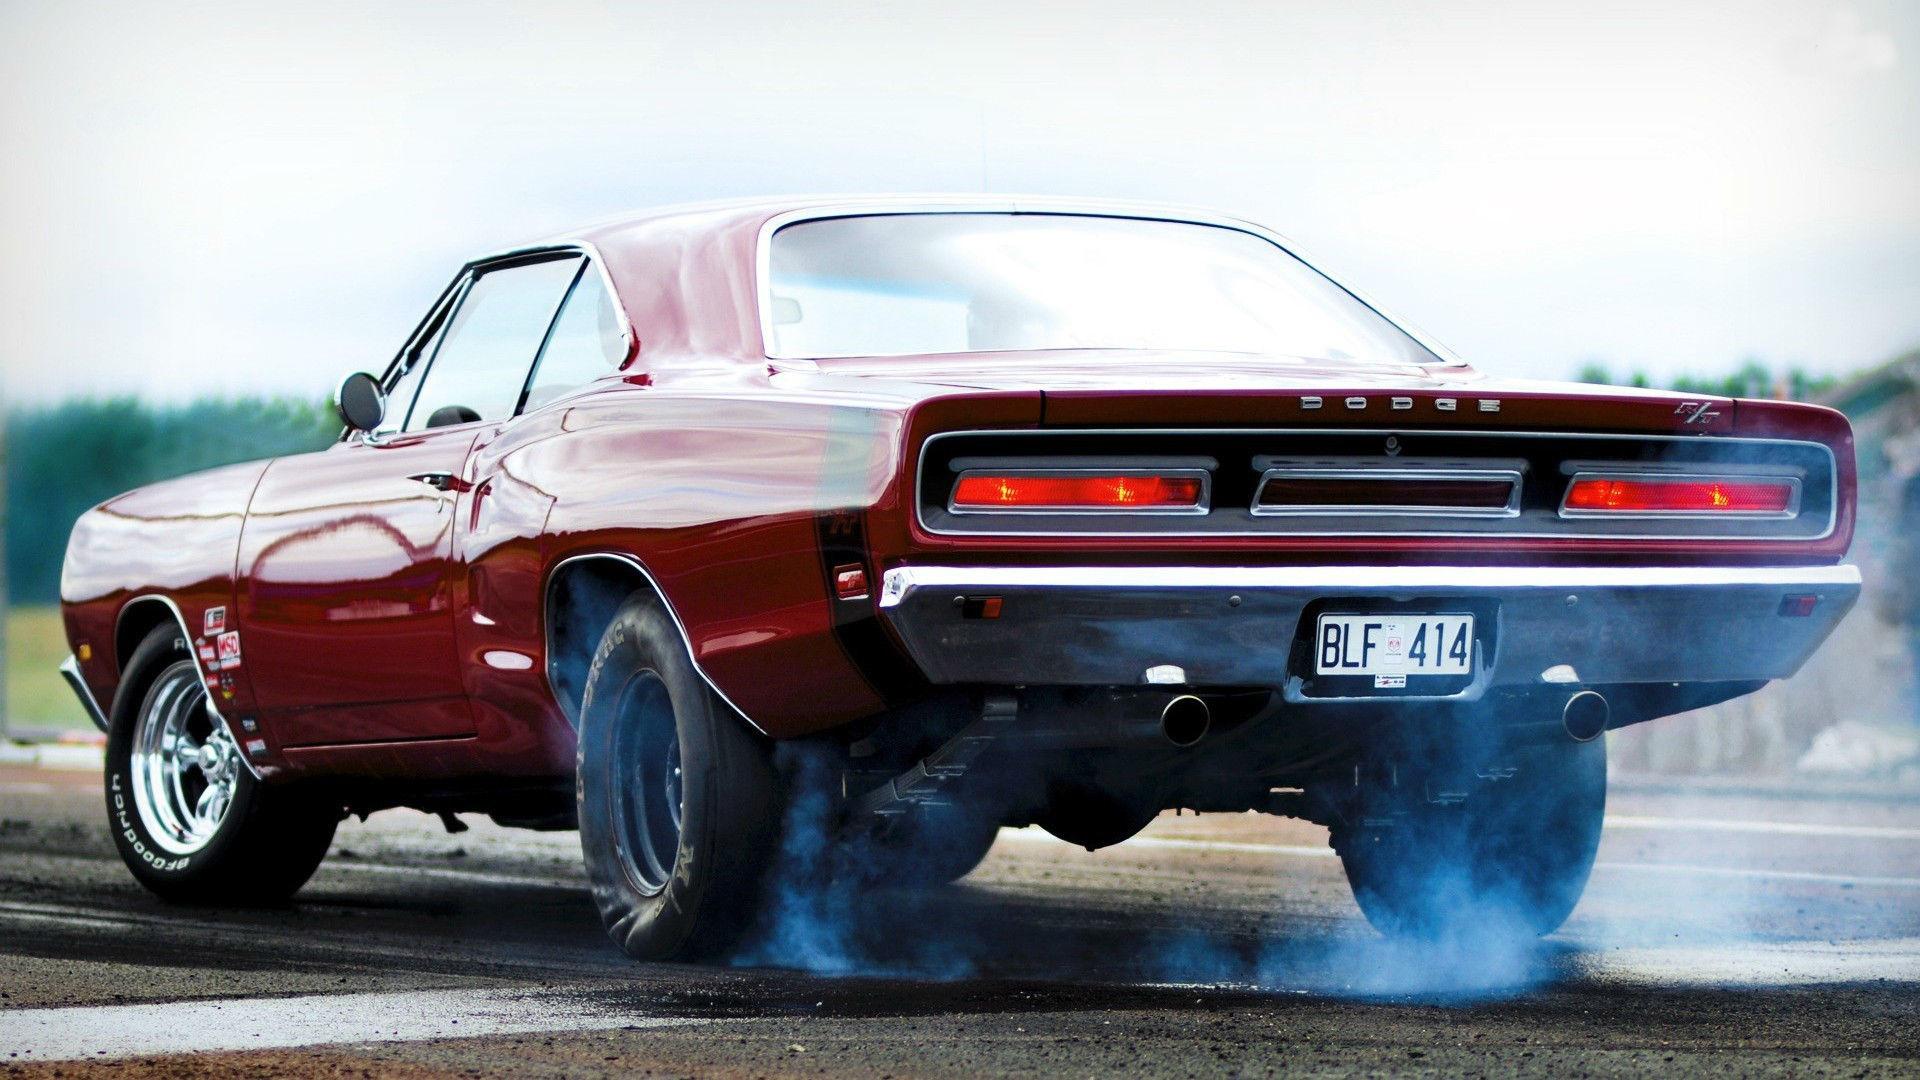 Dodge Charger RT Burnout Wallpaper – HD